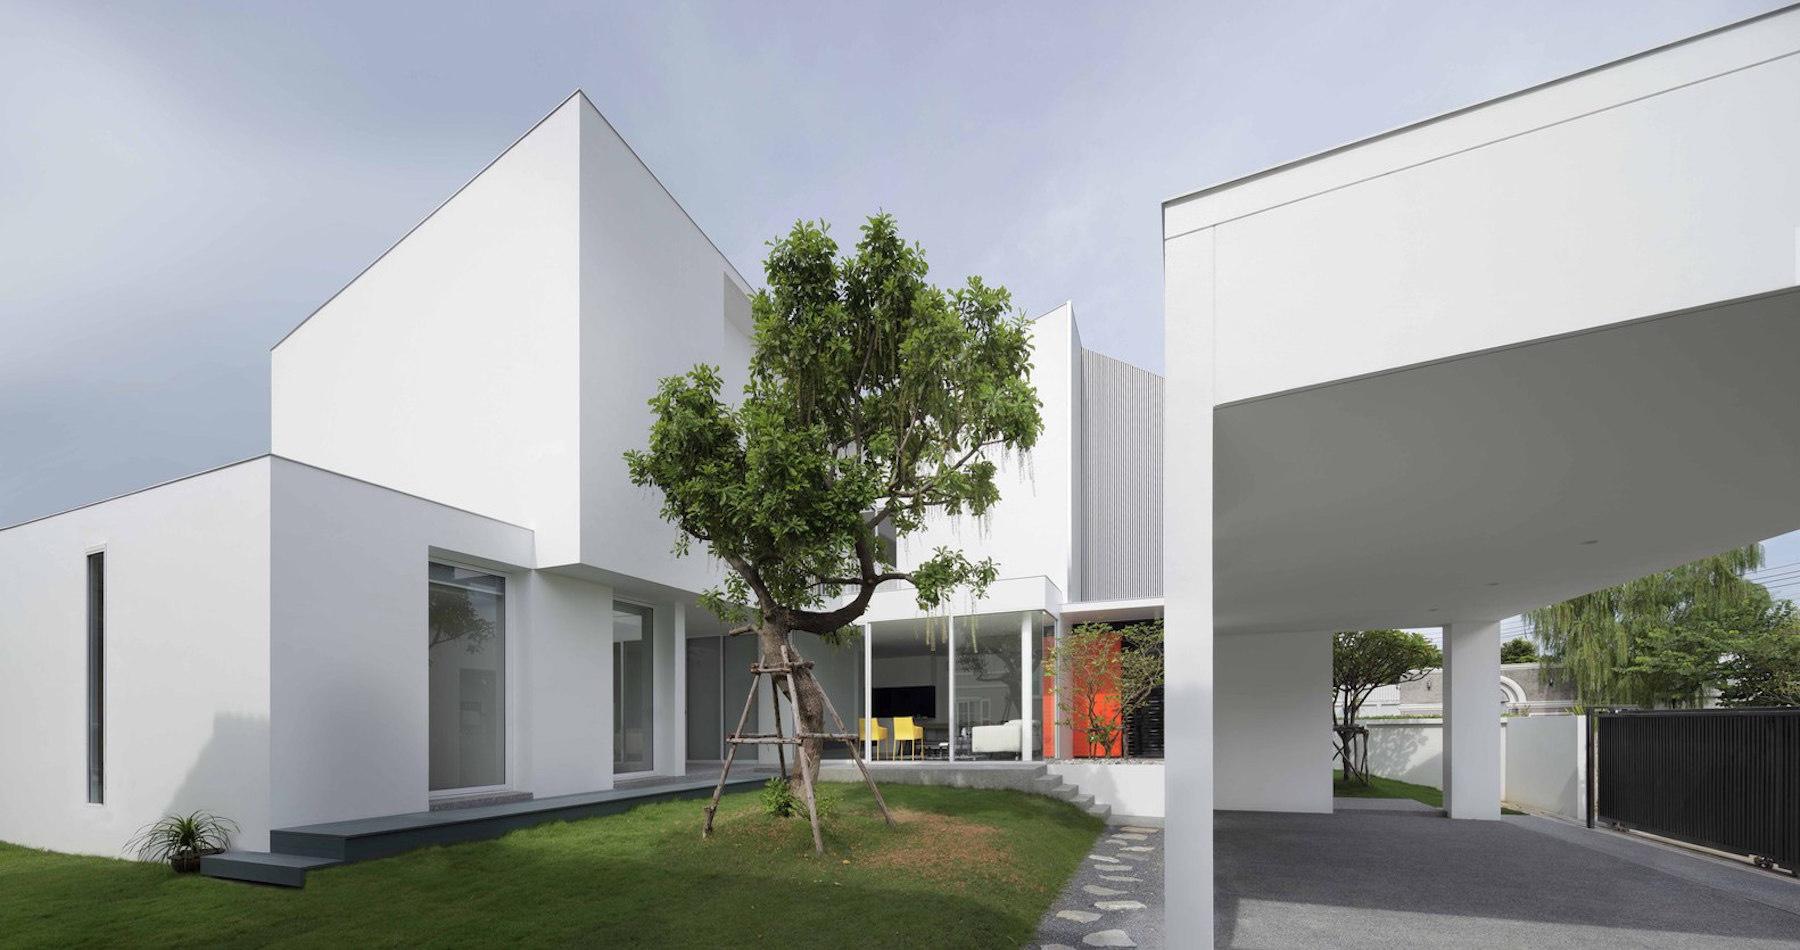 iGNANT-Architecture-Ayutt-And-Associates-Design-White-Box-House-27